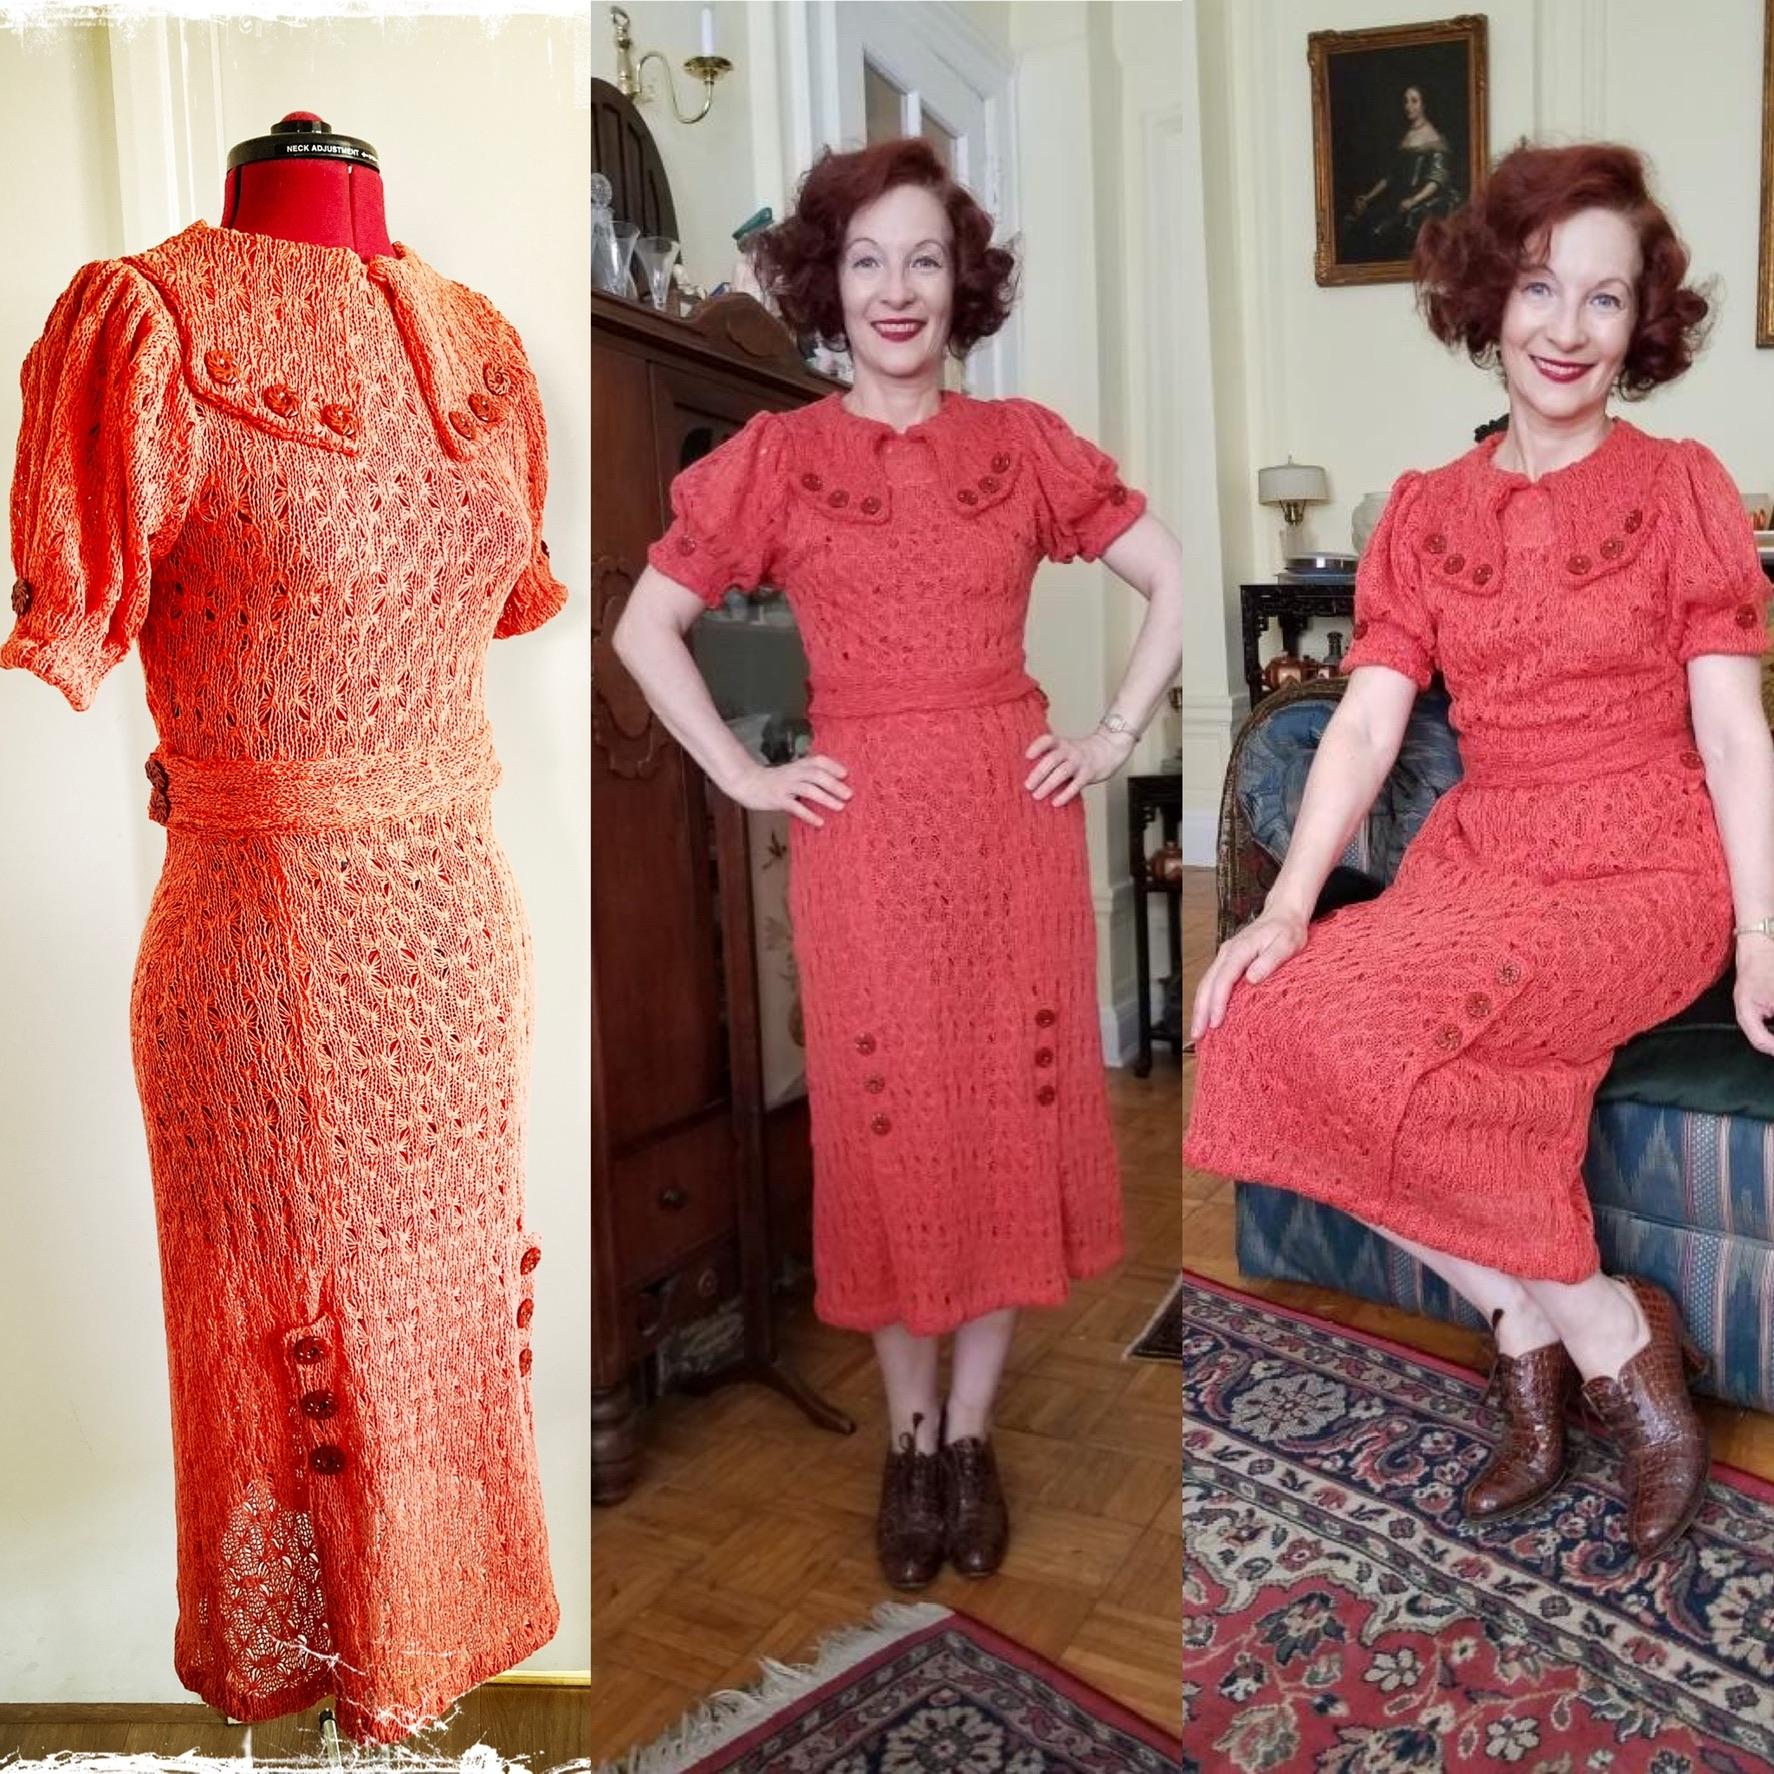 1930s style crochet knit sweater&skirt set